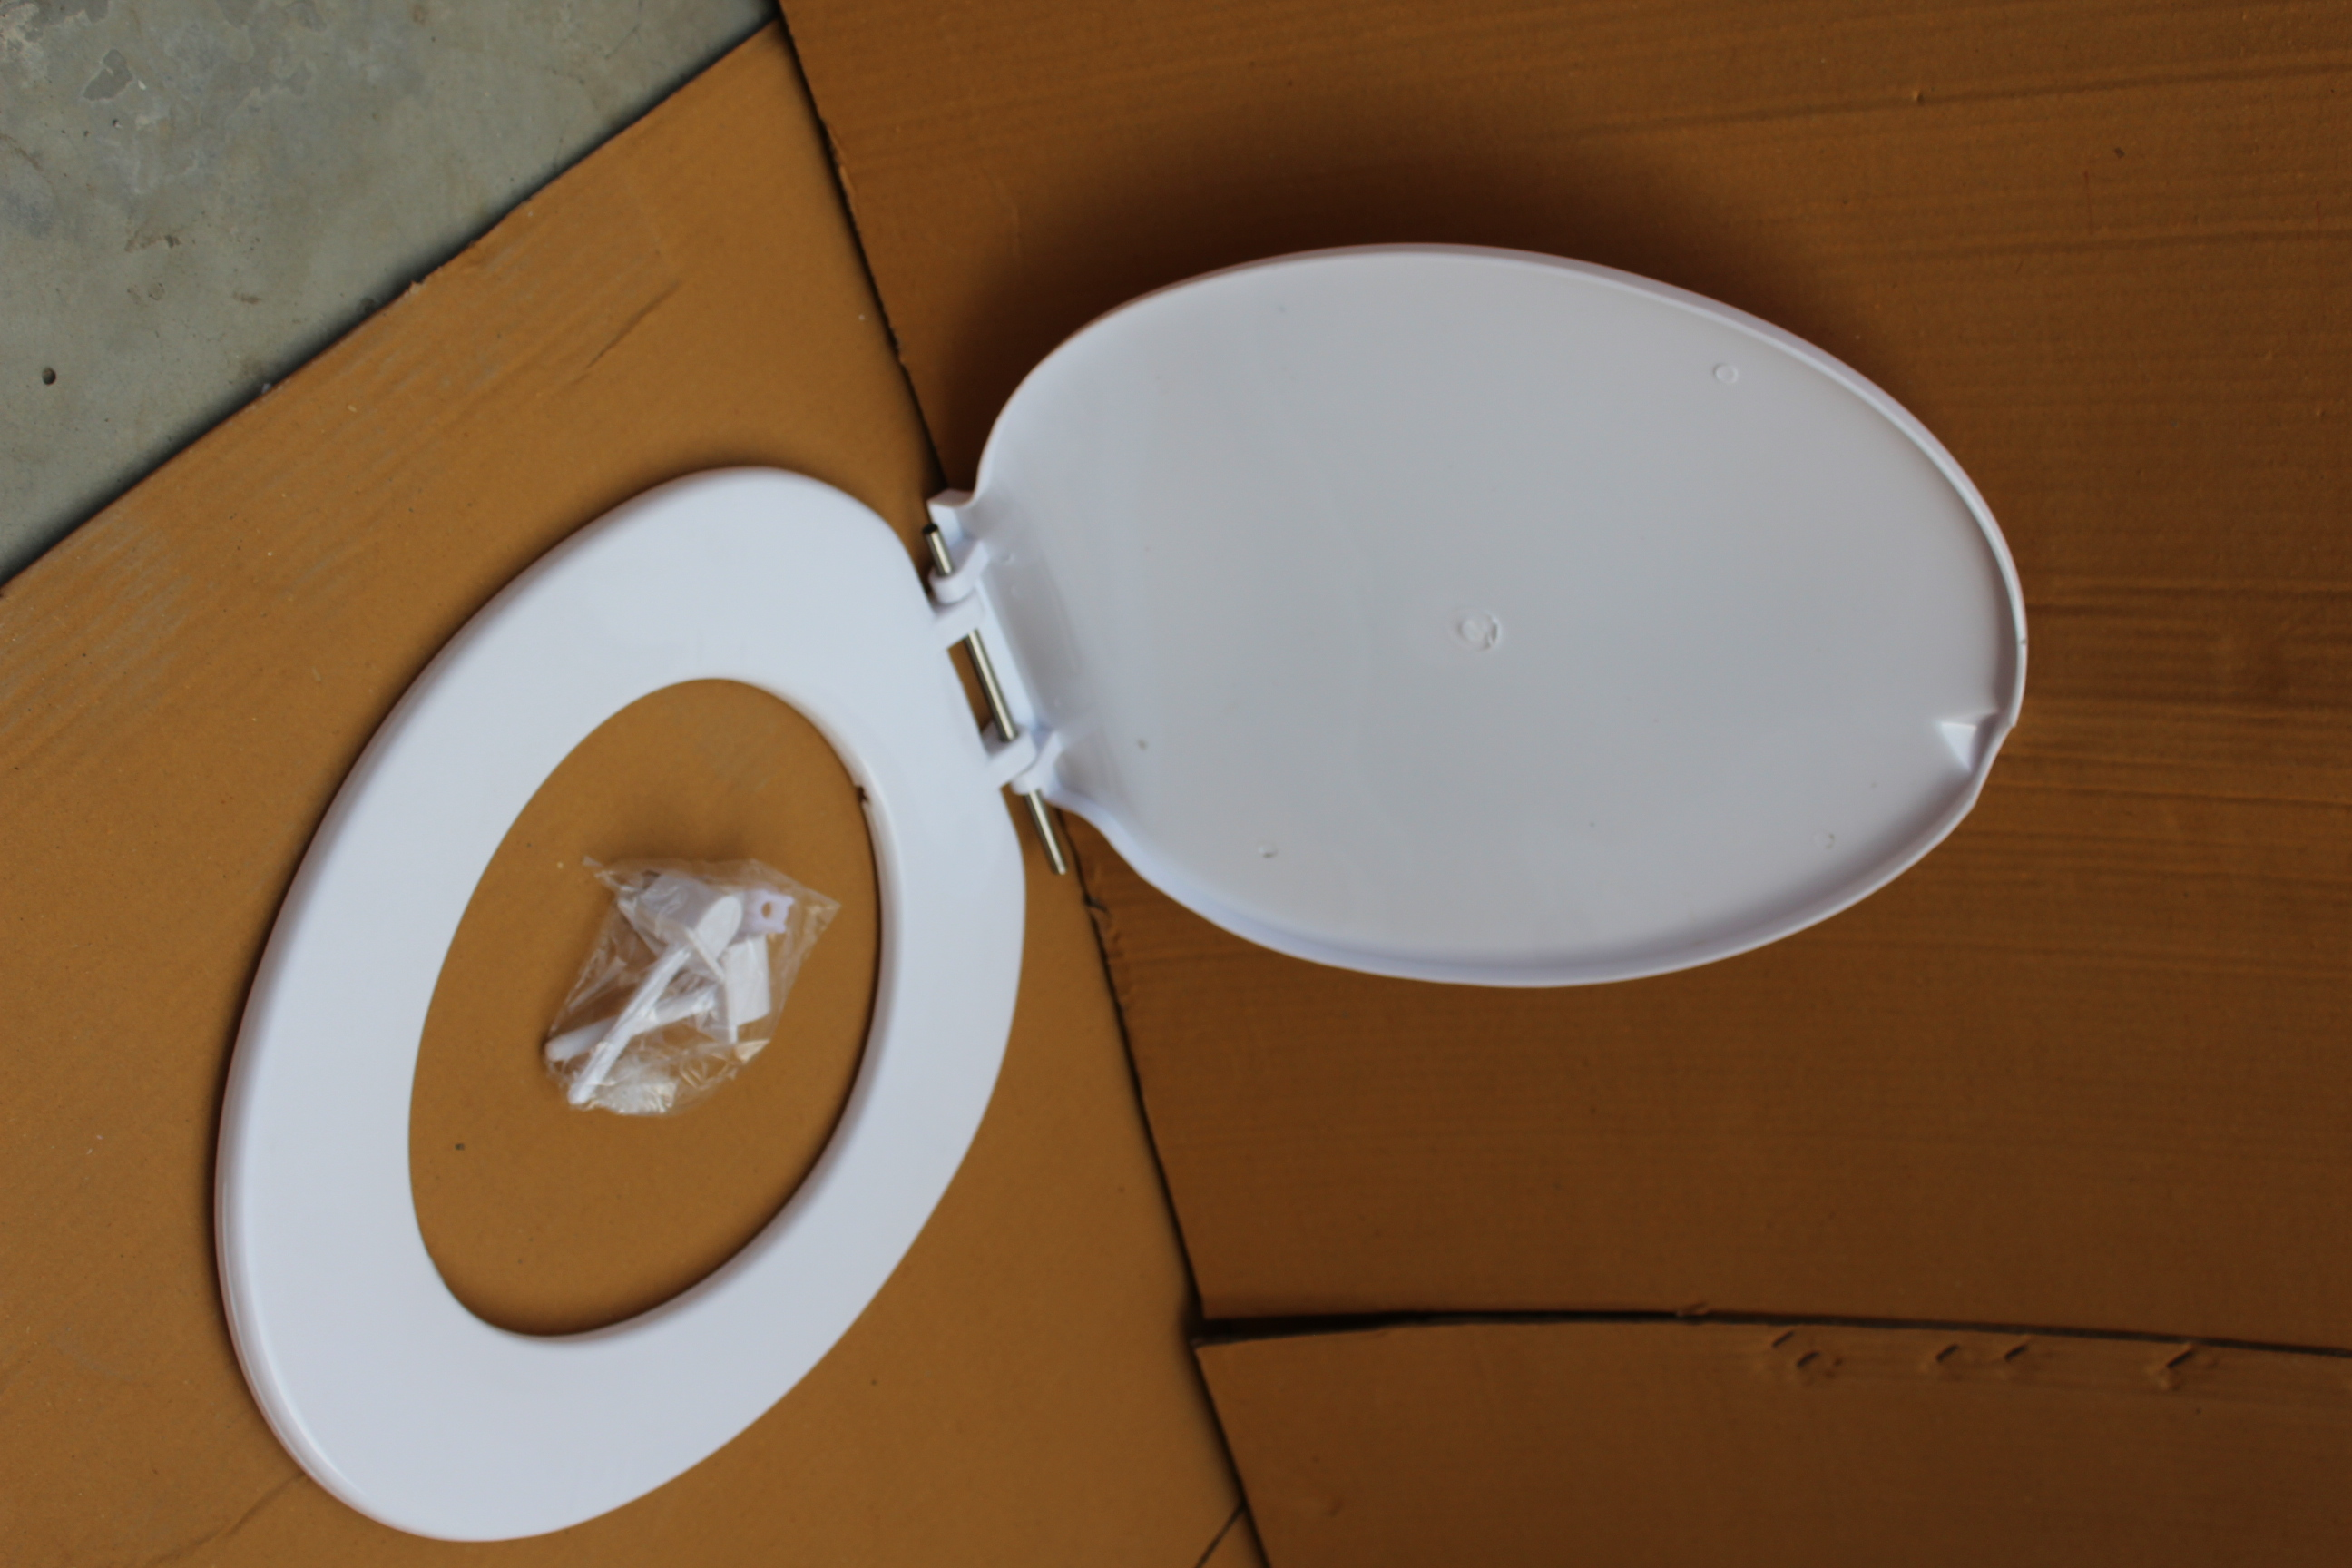 S S Rod Toilet Seat Cover